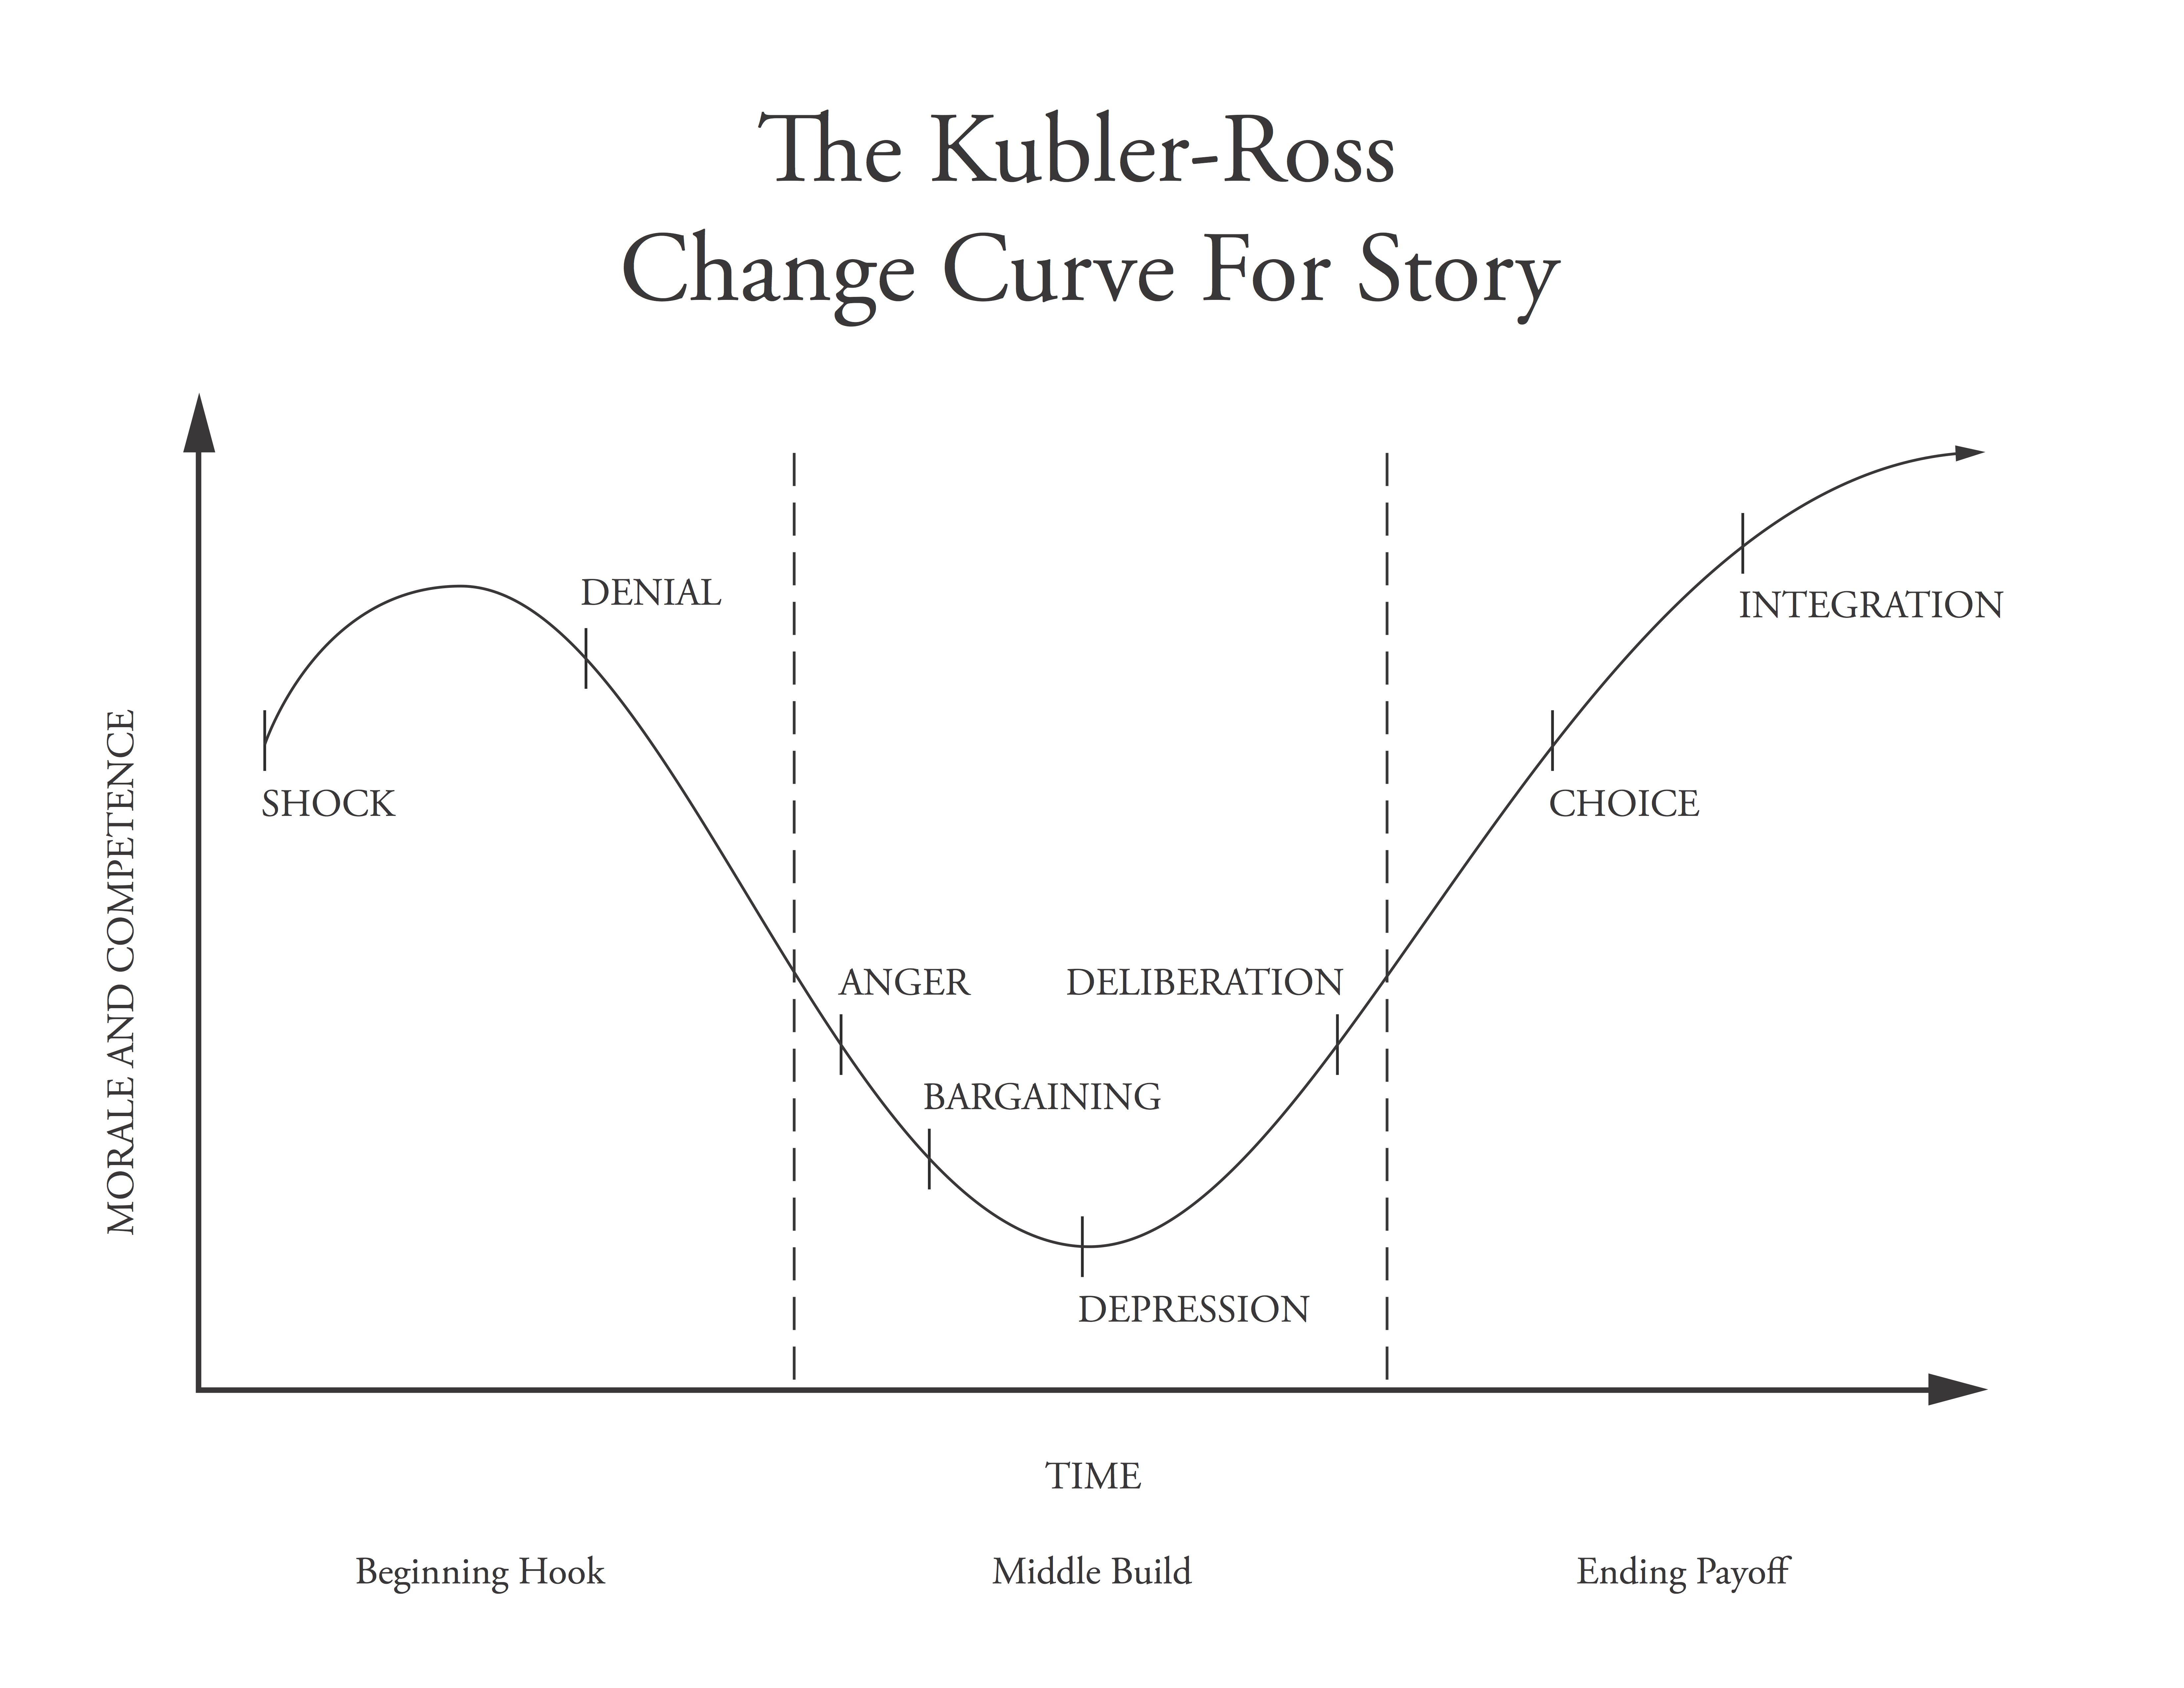 Kubler-Ross Change Curve for Story | Writing | Pinterest